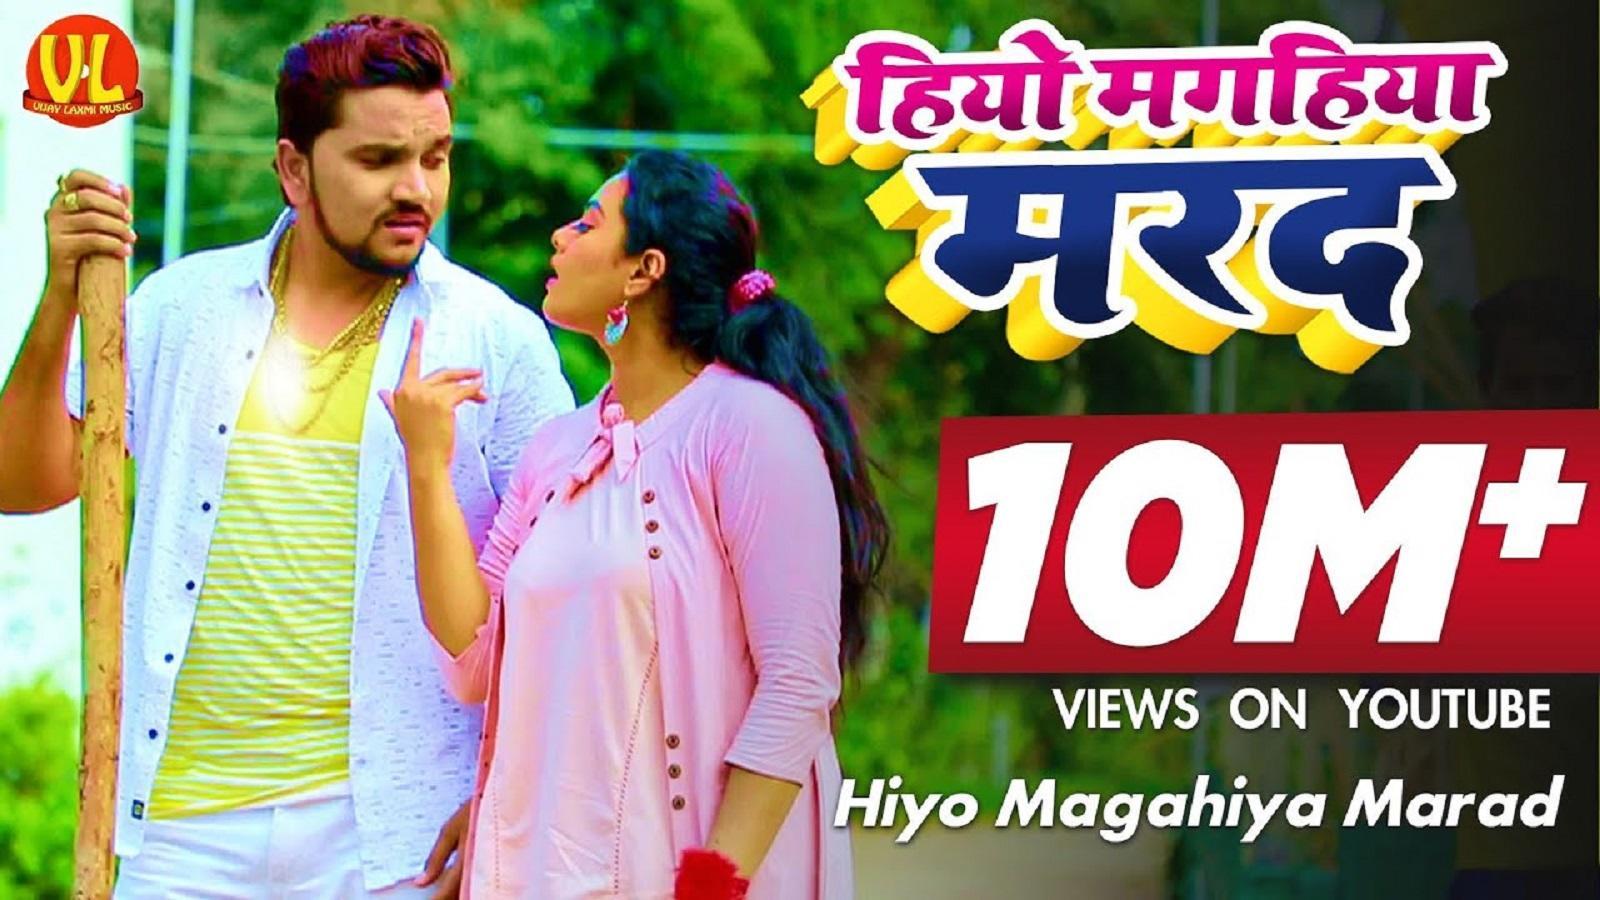 New Bhojpuri Songs Videos 2020 Gunjan Singh And Tannu Shree S Latest Bhojpuri Song Hiyo Magahiya Marad